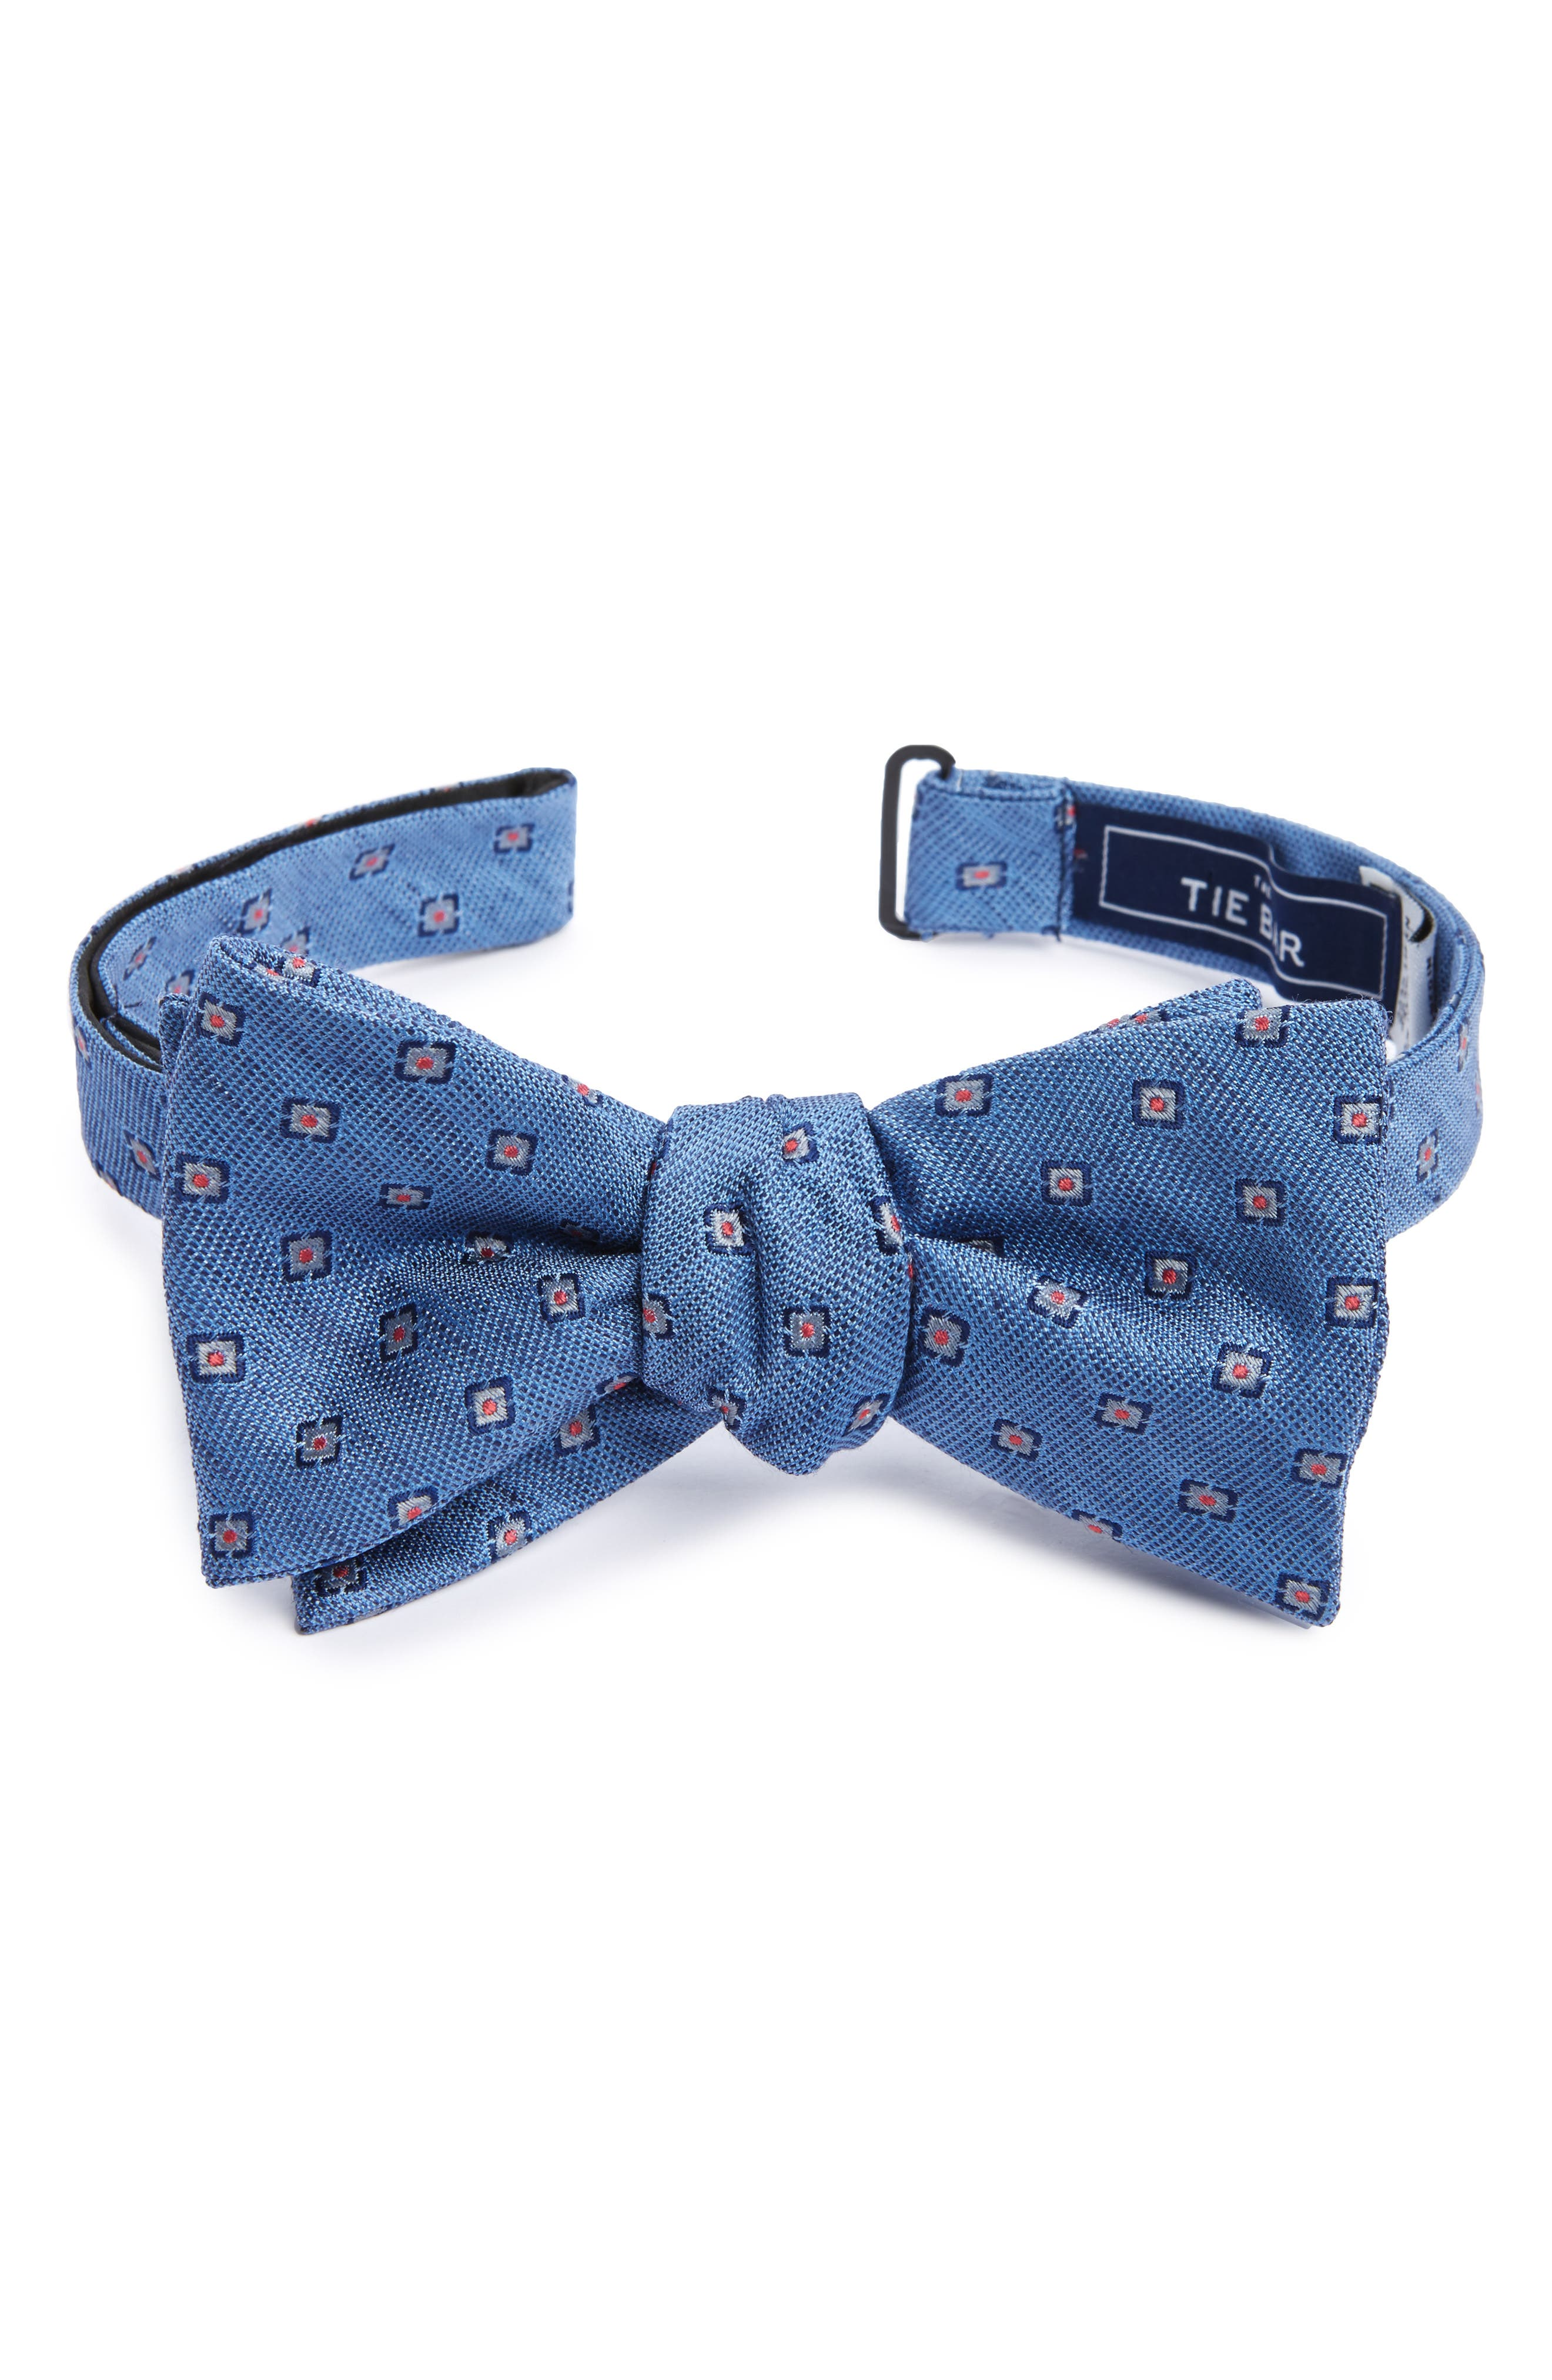 Main Image - The Tie Bar Medallion Scene Silk & Linen Bow Tie